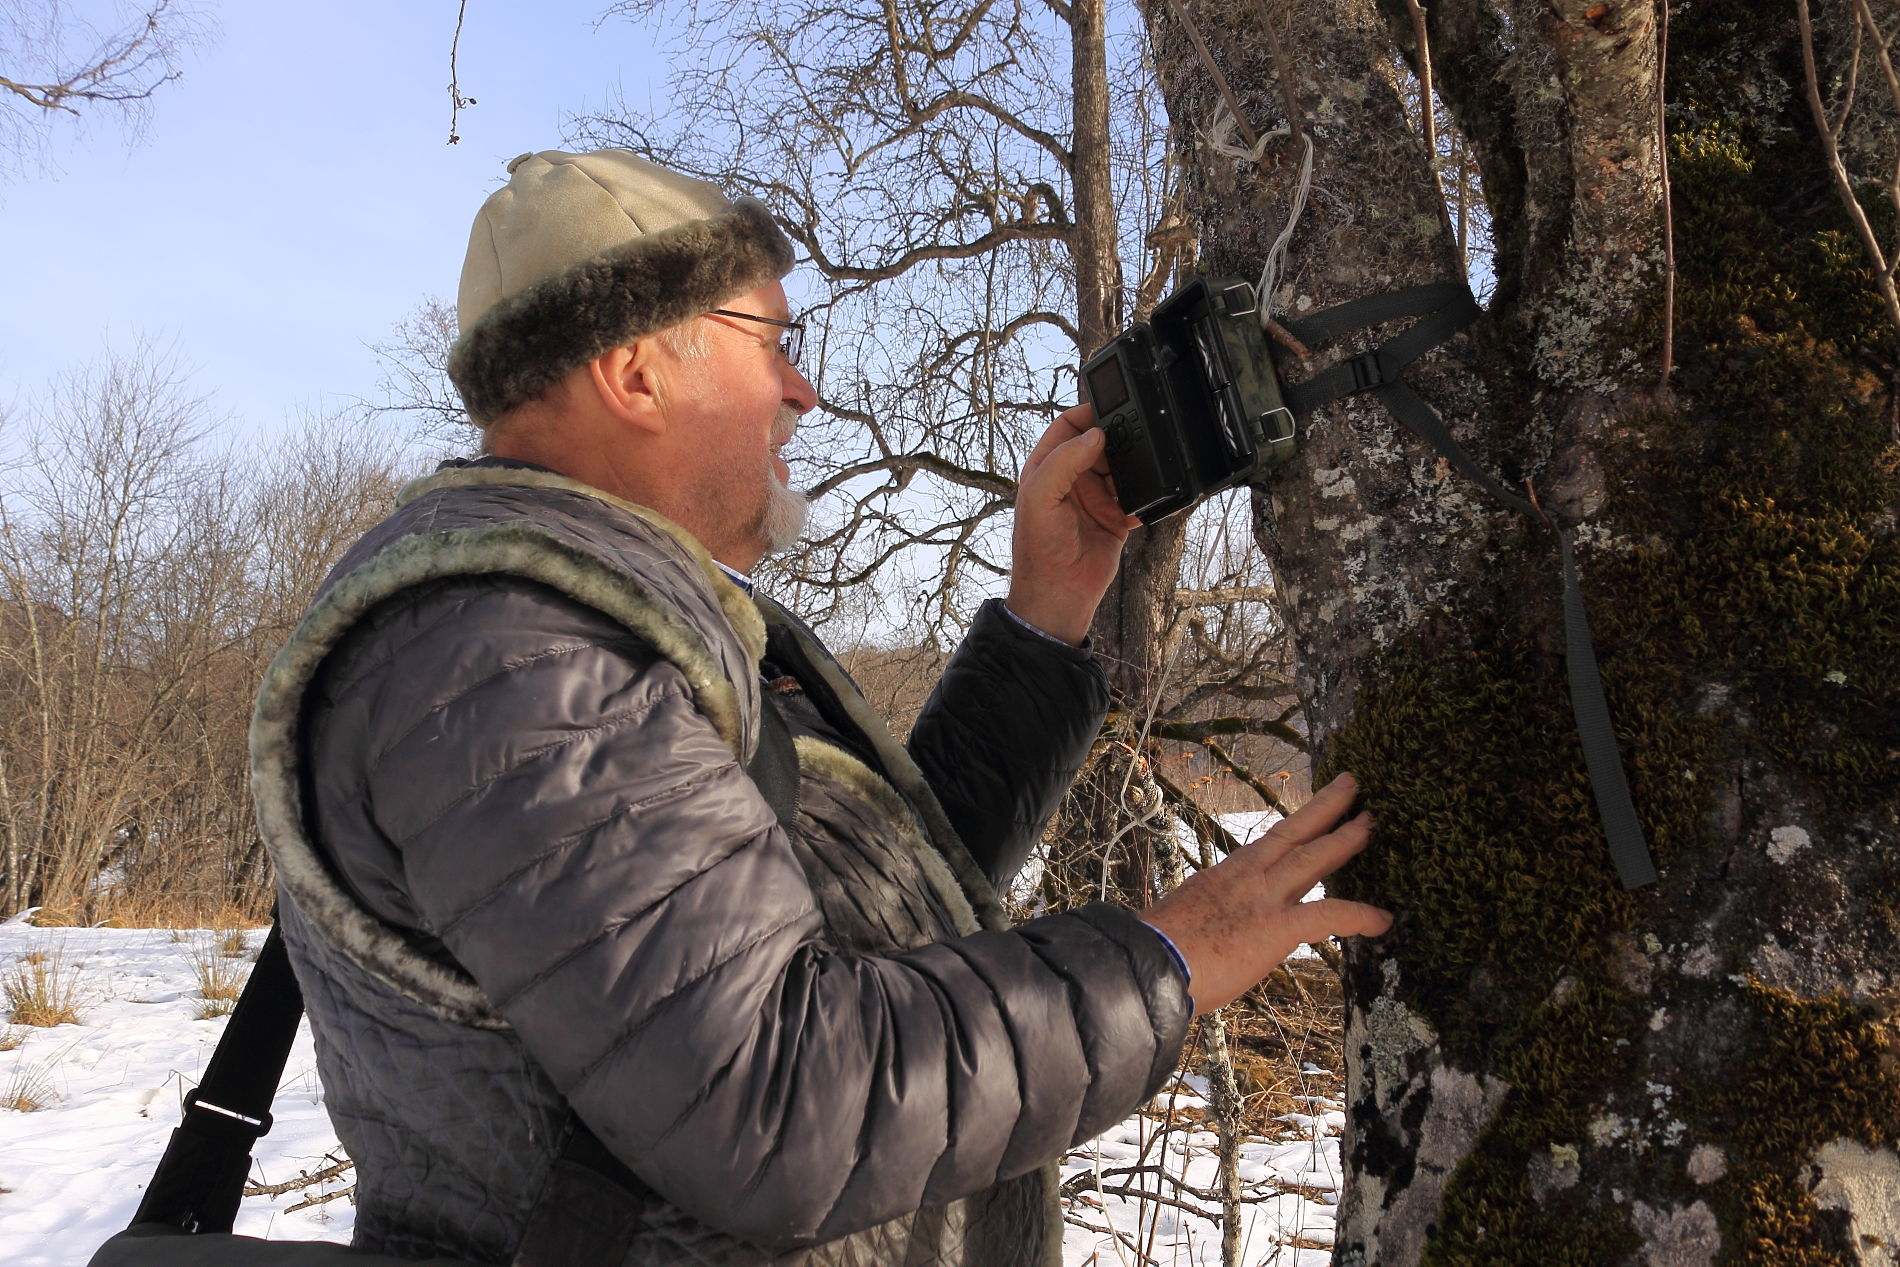 Профессор Кудактин осматривает фотоловушку ©Фото с сайта commons.wikimedia.org